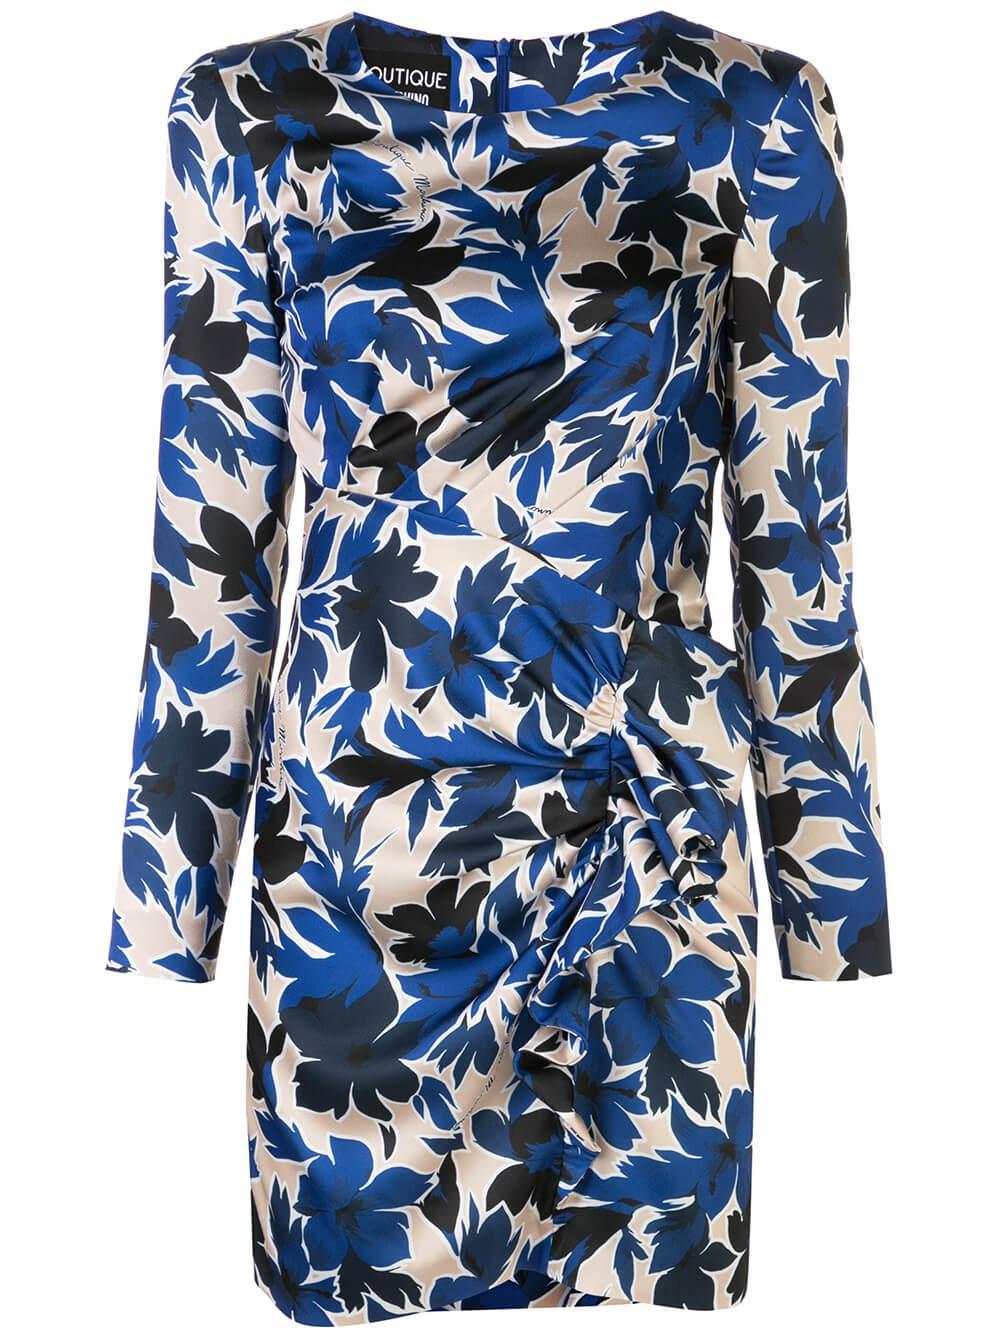 Floral Print Dress Item # 0403-1152